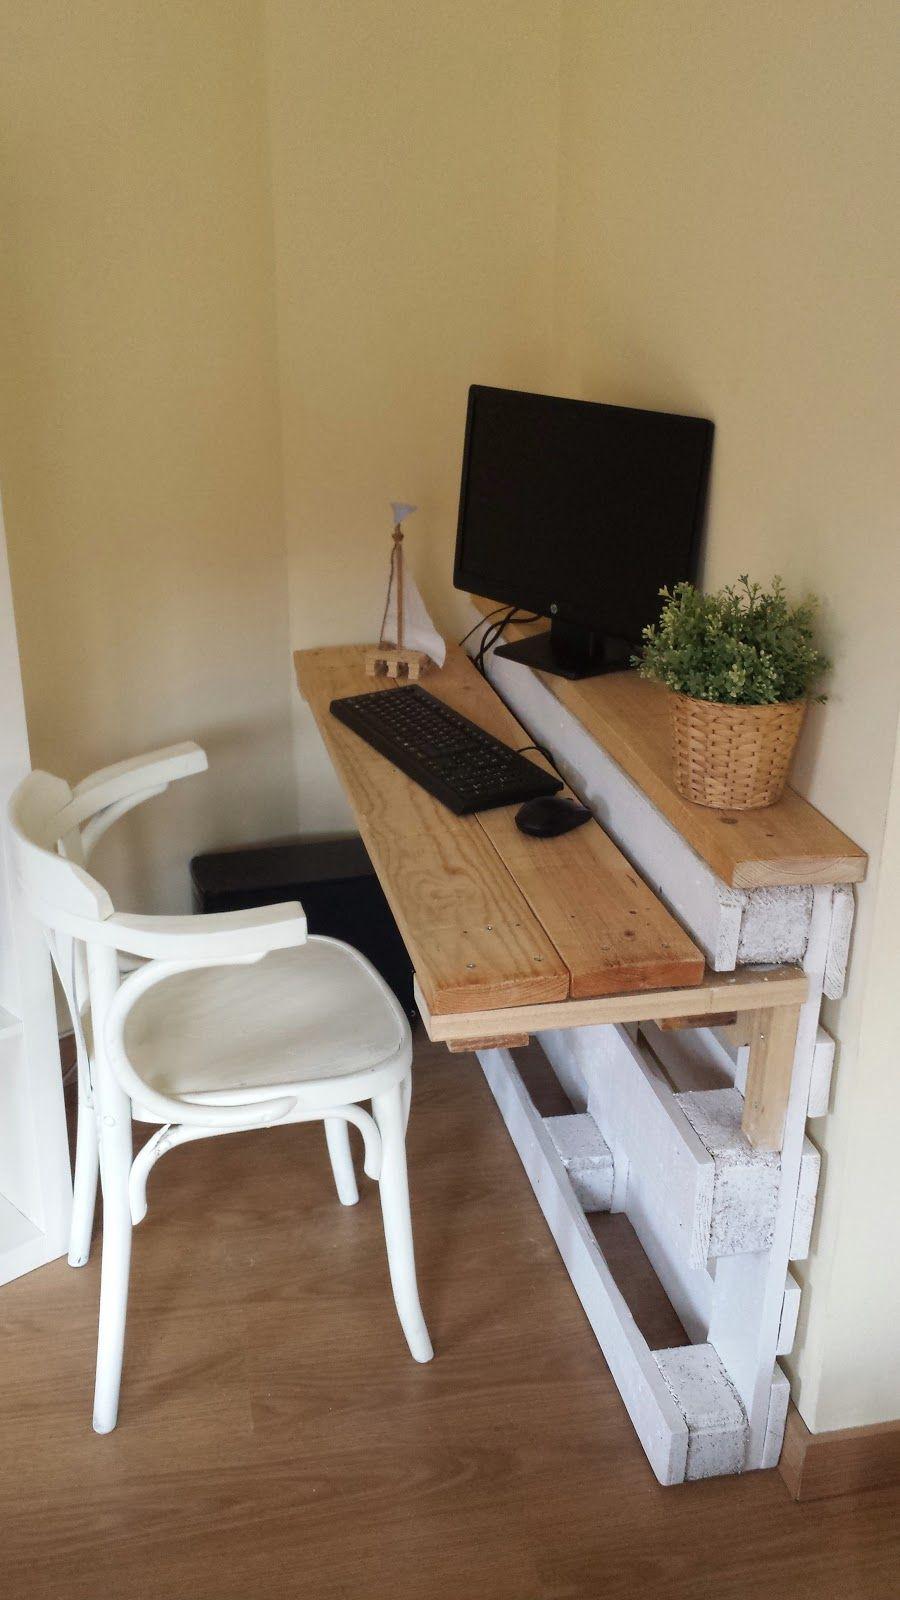 mi barquitodepalet | room | pinterest | desks, clever and pallets